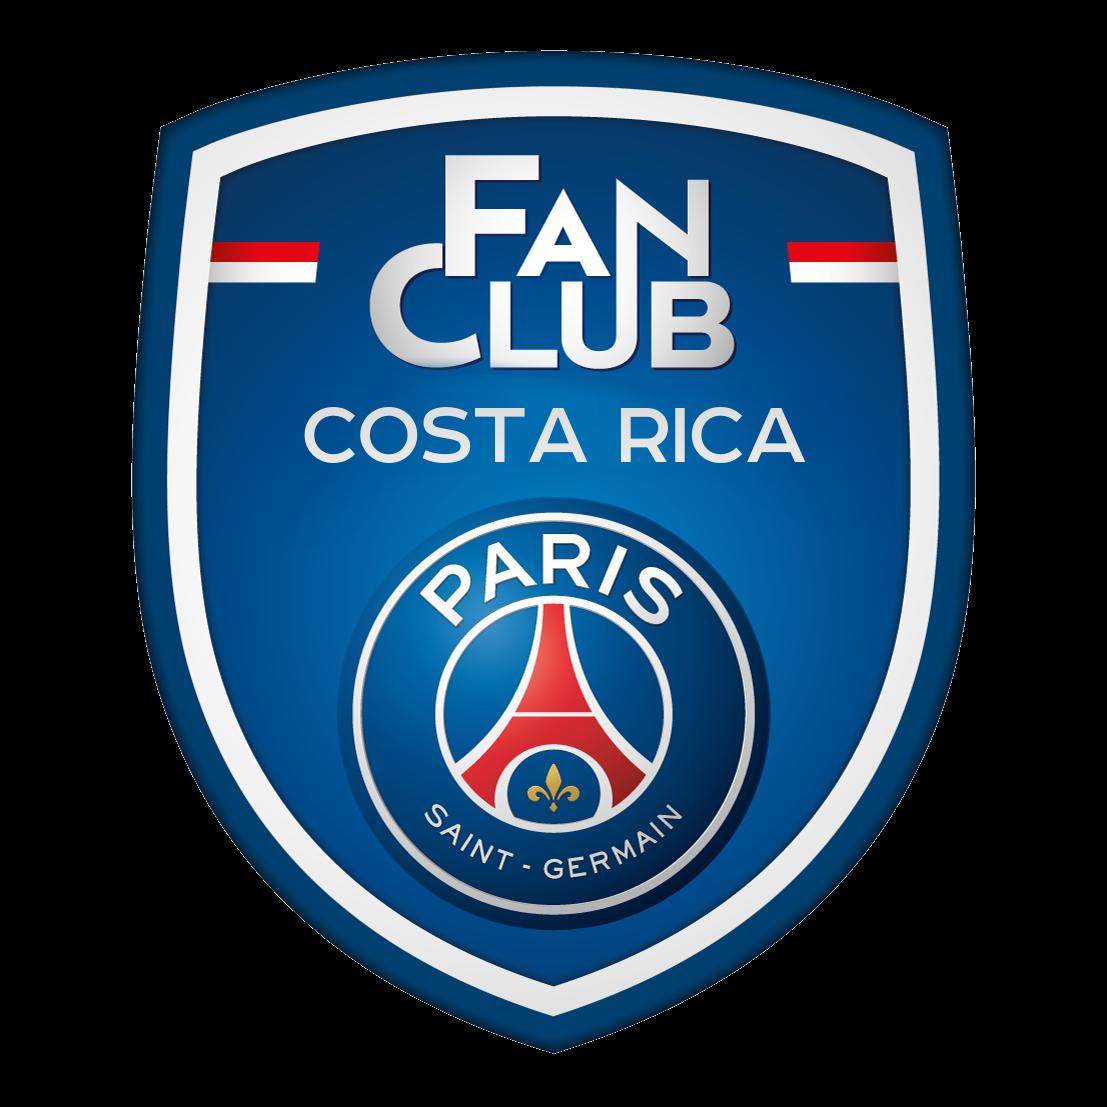 PSG Fan Club Costa Rica